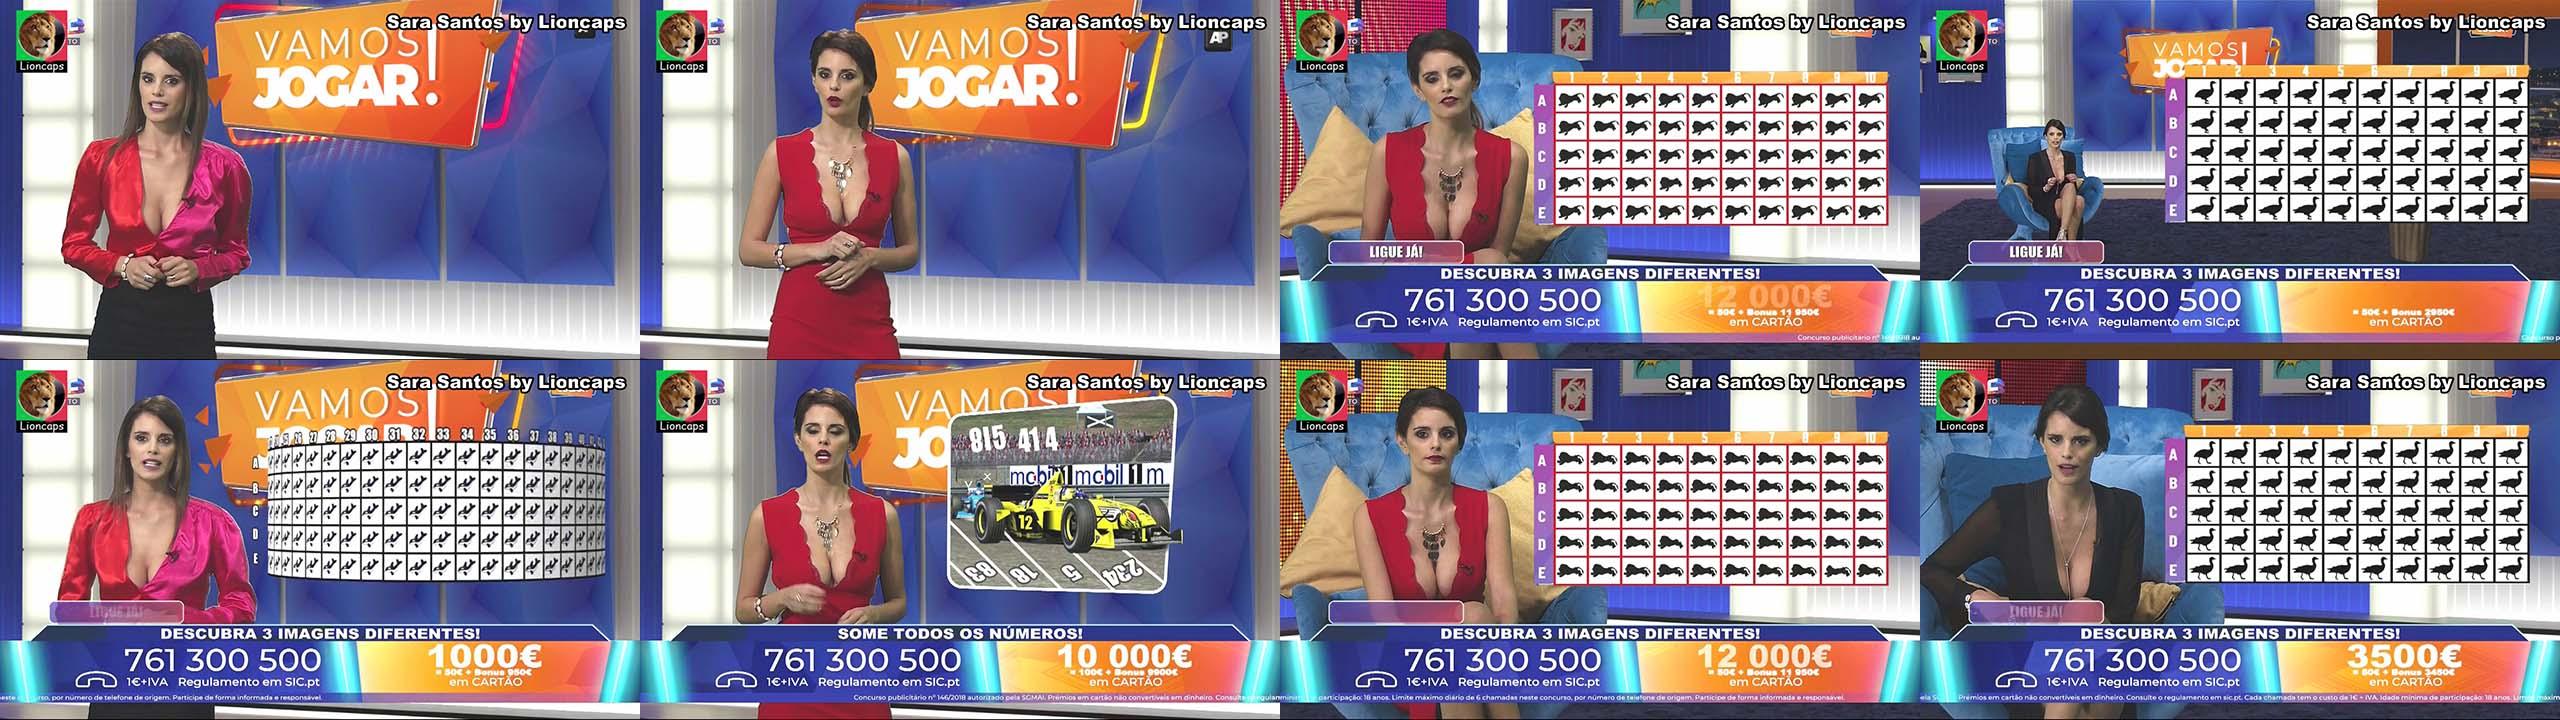 360774316_sara_santos_vamos_jogar_1080_lioncaps_17_03_2019_01_122_490lo.jpg